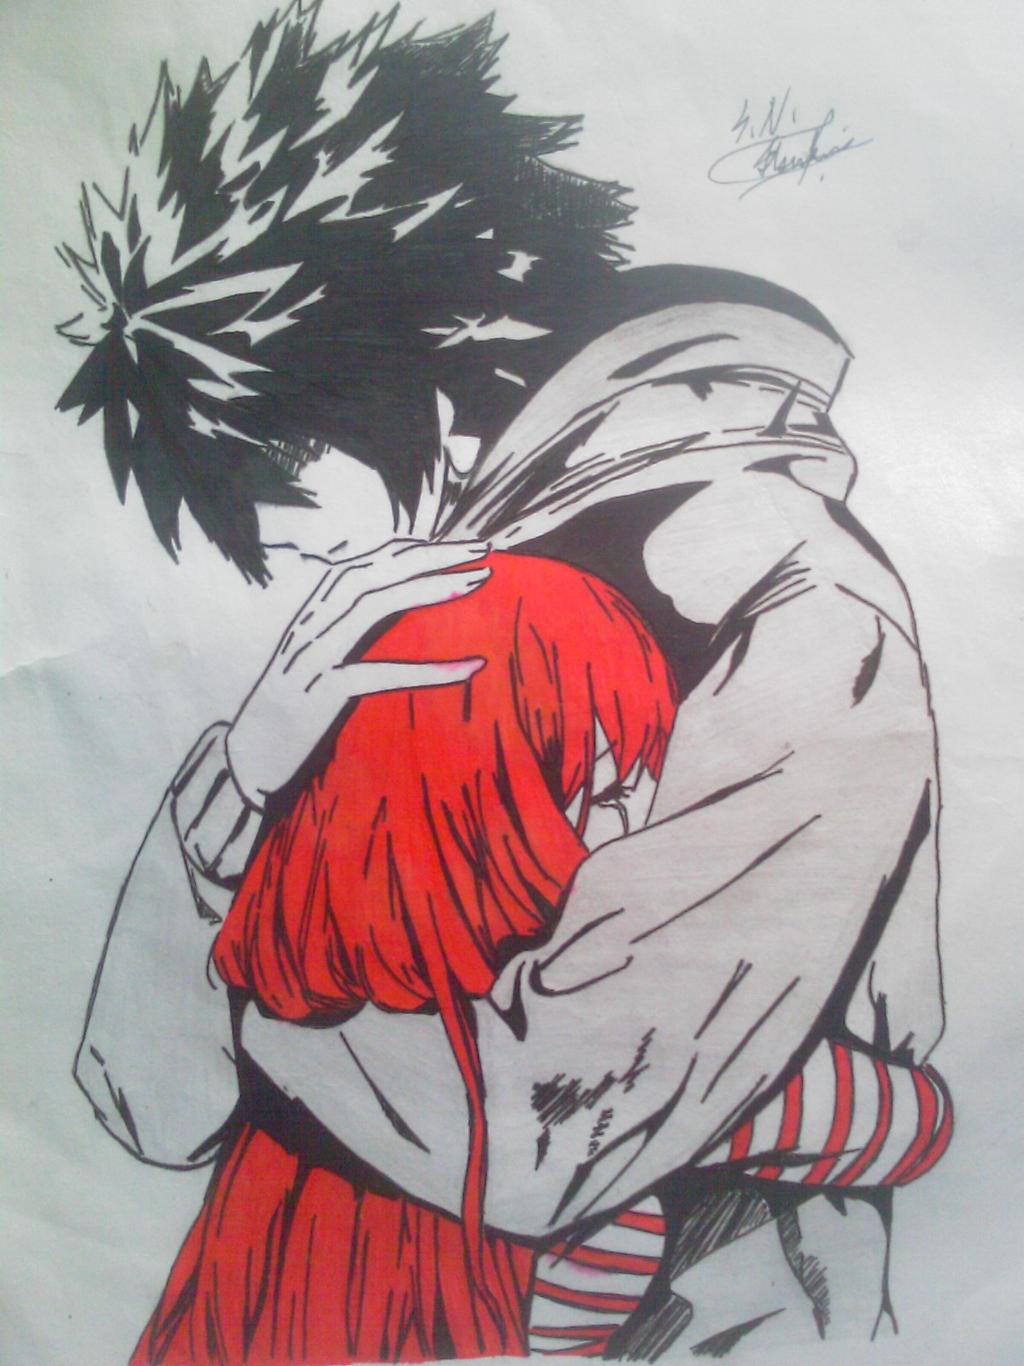 Old Drawing Random Anime By Kuyomi01 On Deviantart